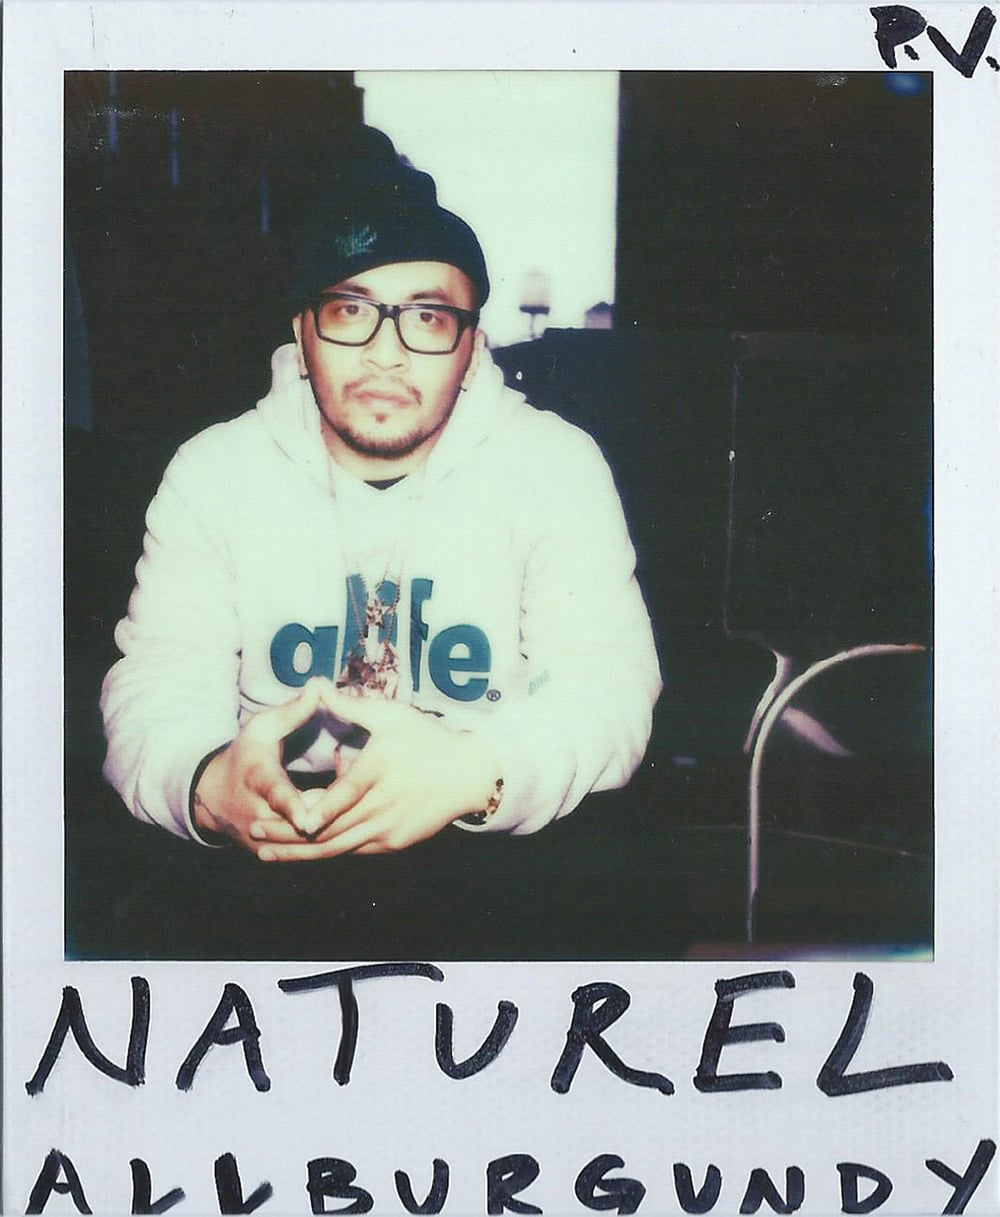 naturel1.0.jpg